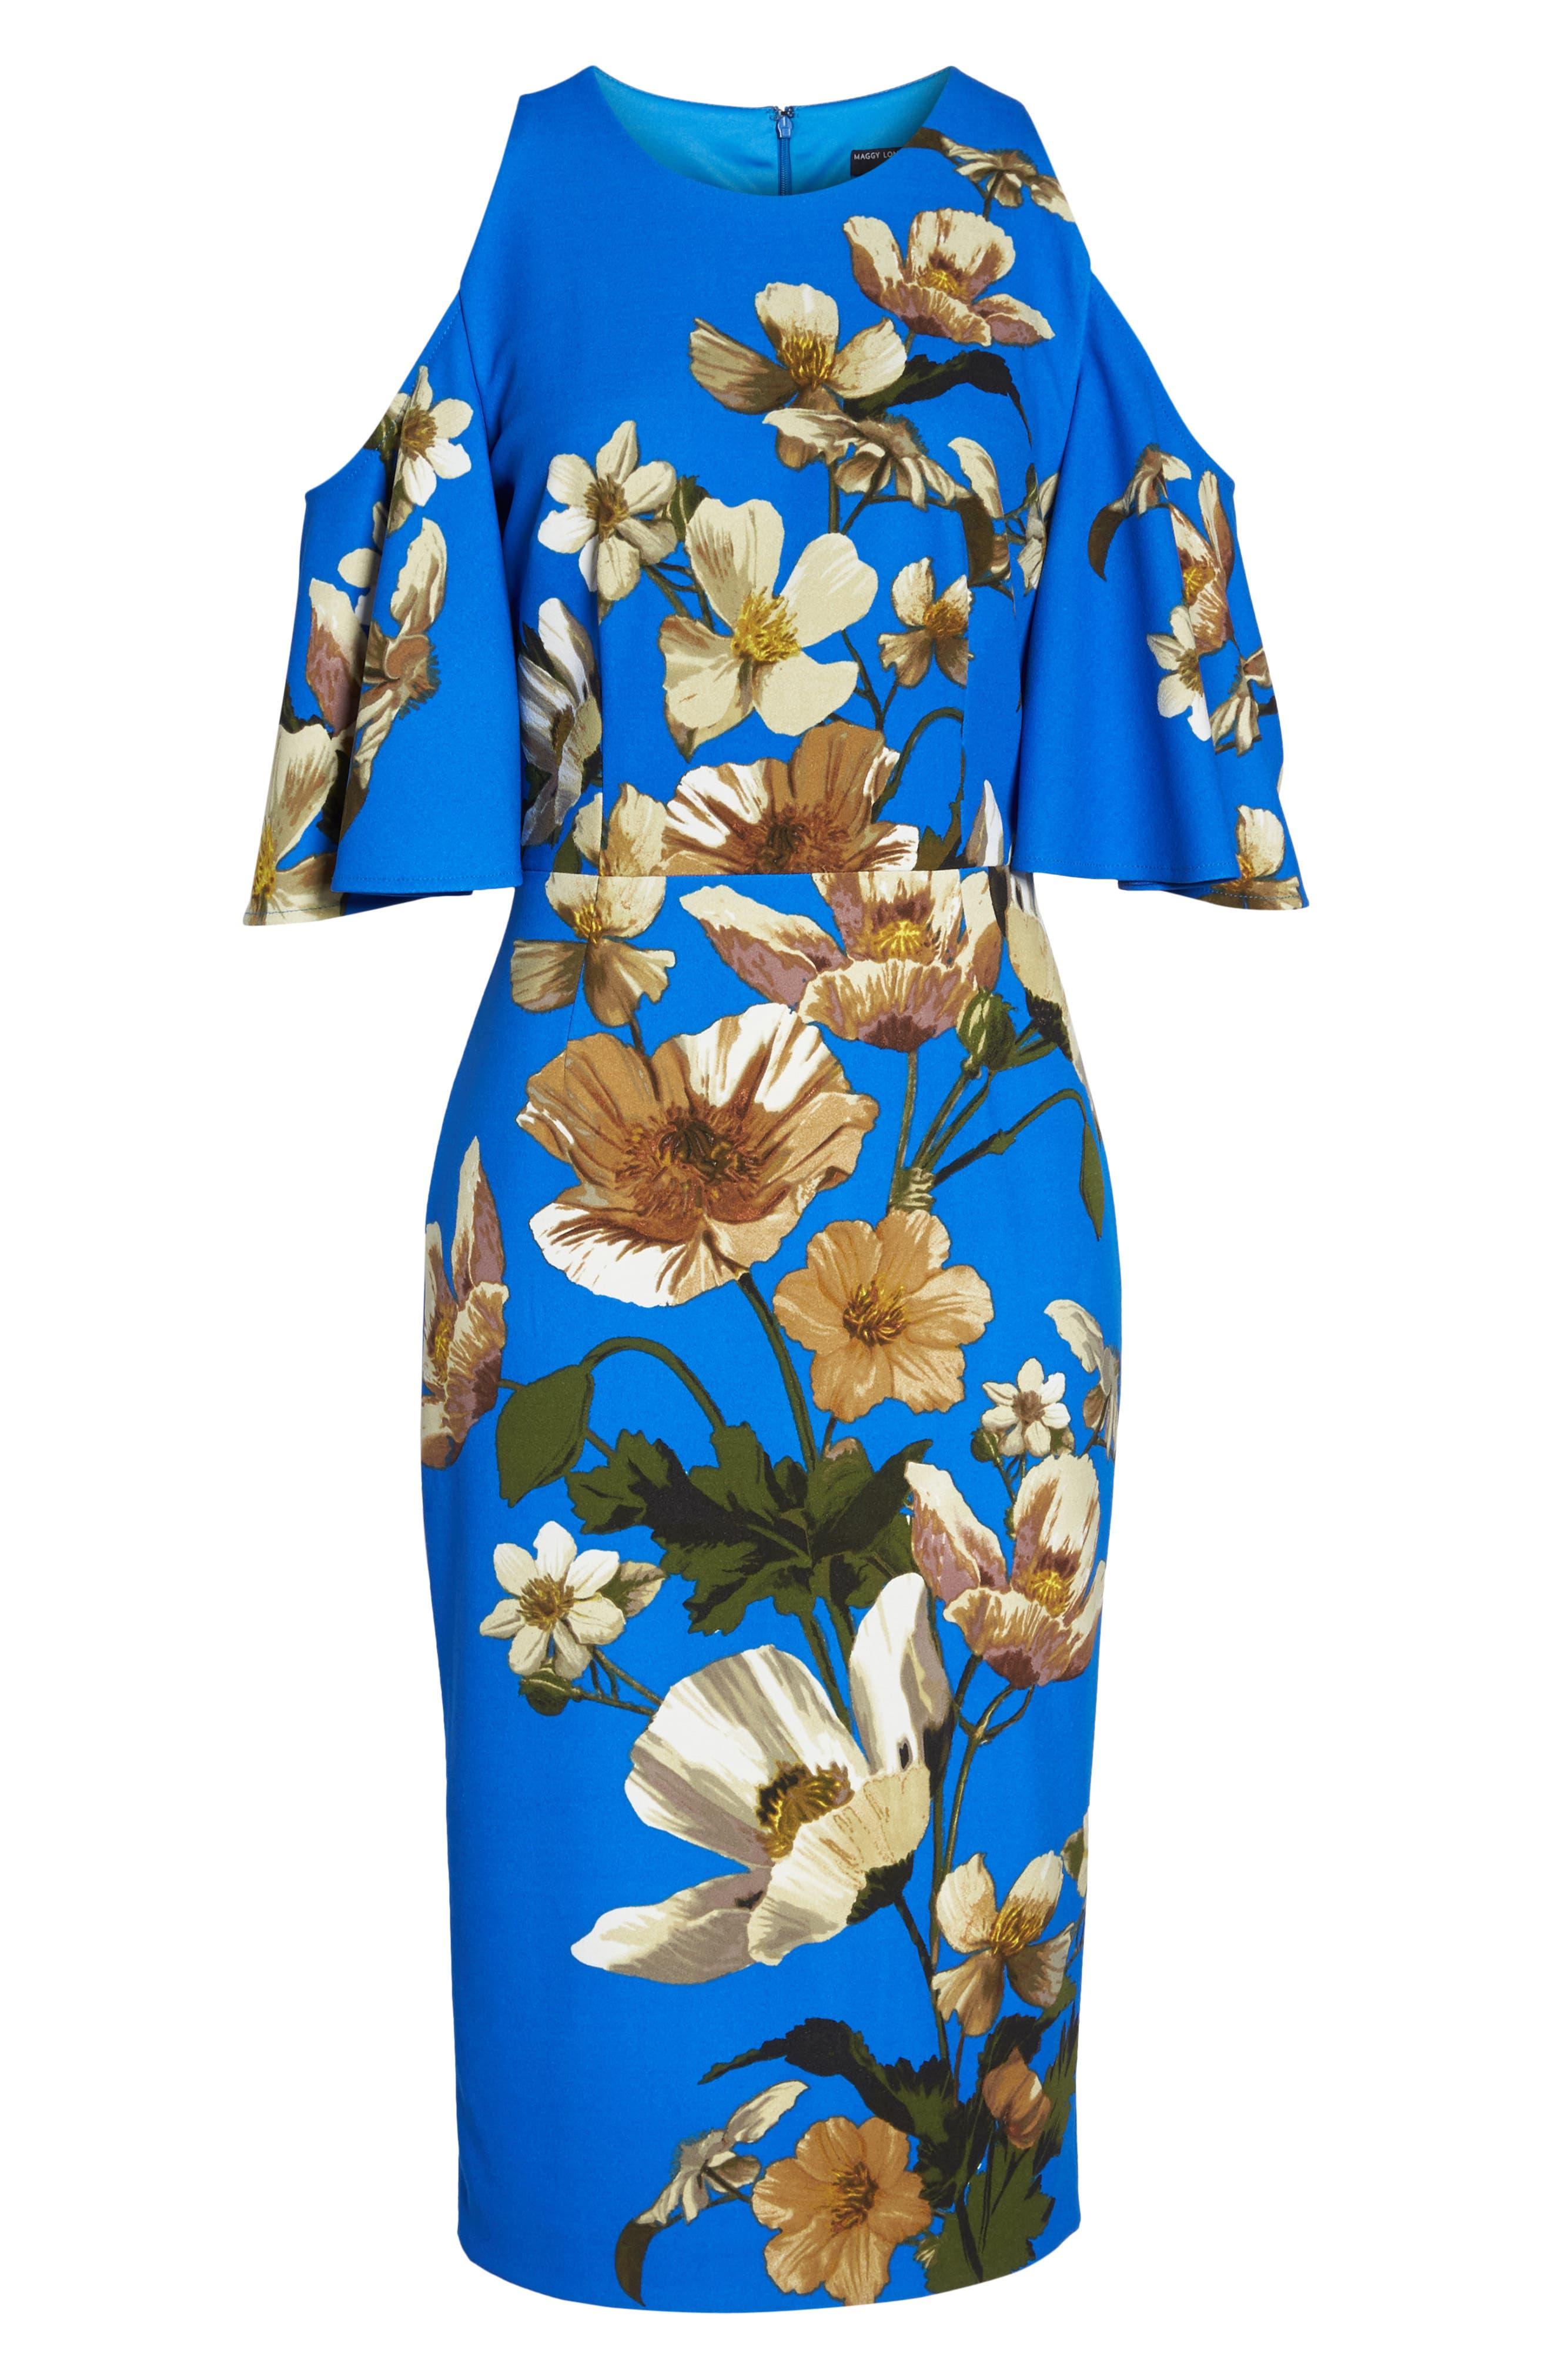 Floral Cold Shoulder Sheath Dress,                             Alternate thumbnail 7, color,                             Blue/ Neutral